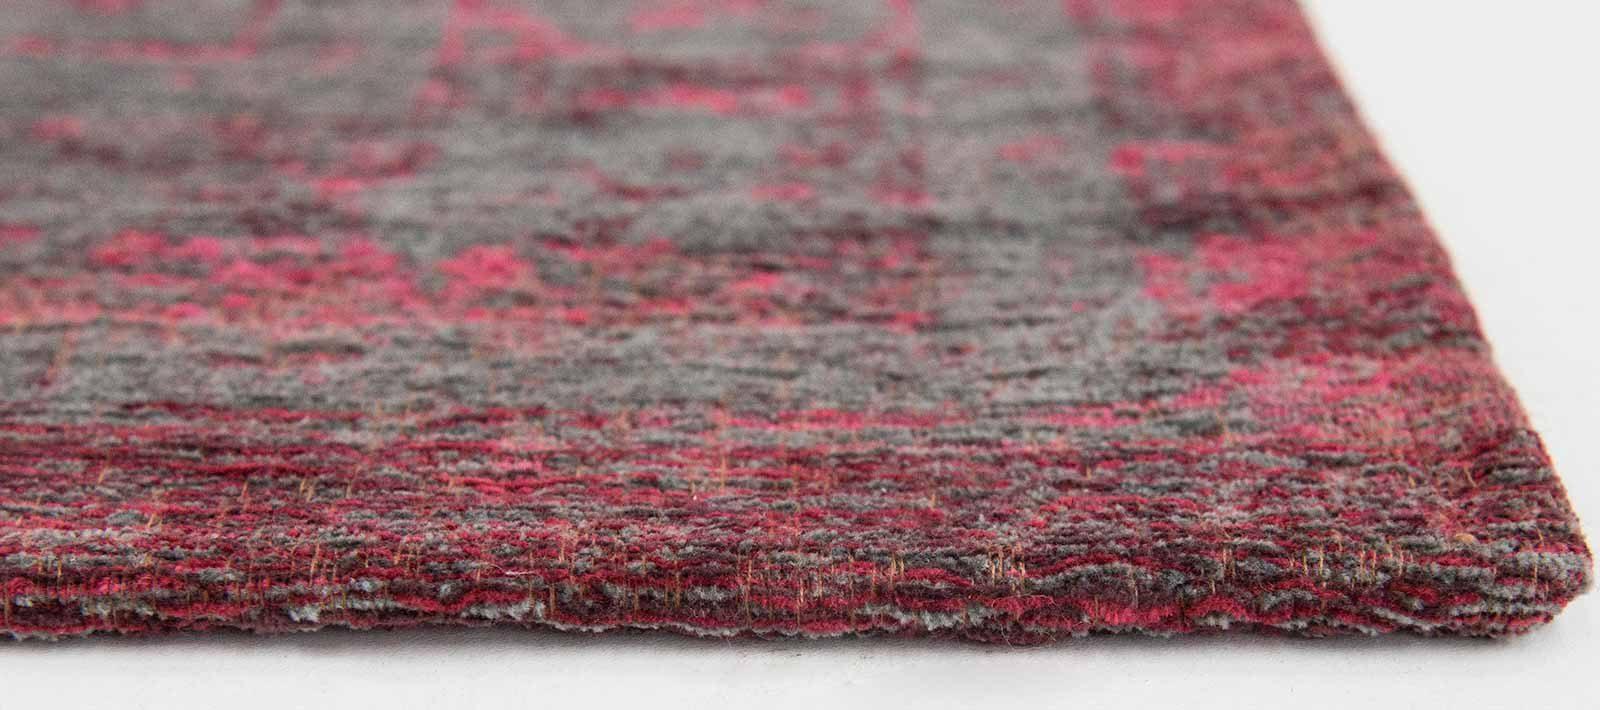 tapijt Louis De Poortere LX8261 Fading World Medaillon Pink Flash side